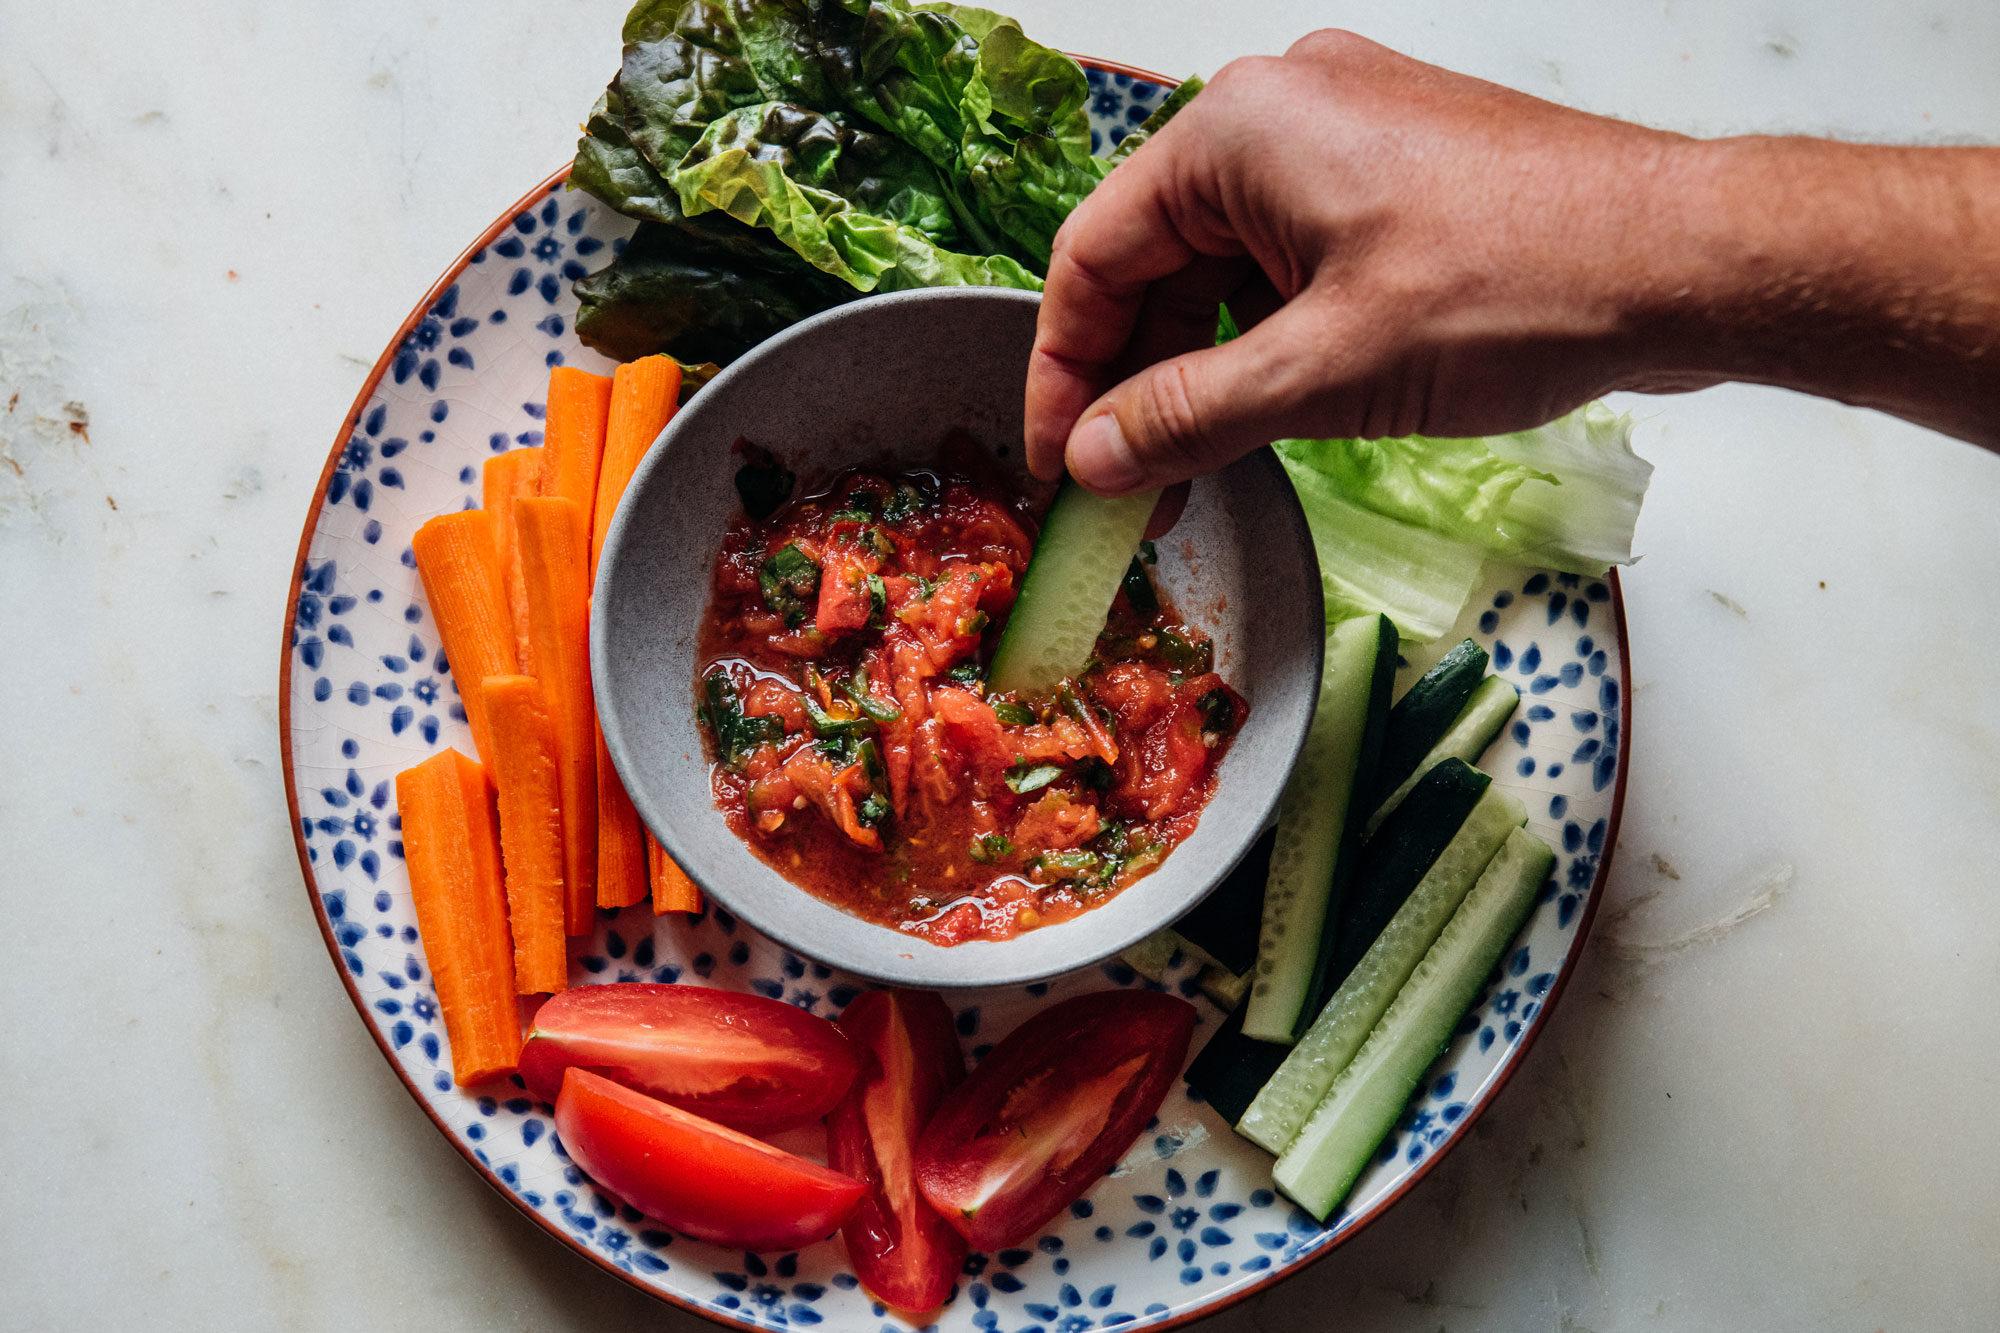 Article-Grilled-Crudite-Dip-Tomato-Yunnan-Chinese-Recipe